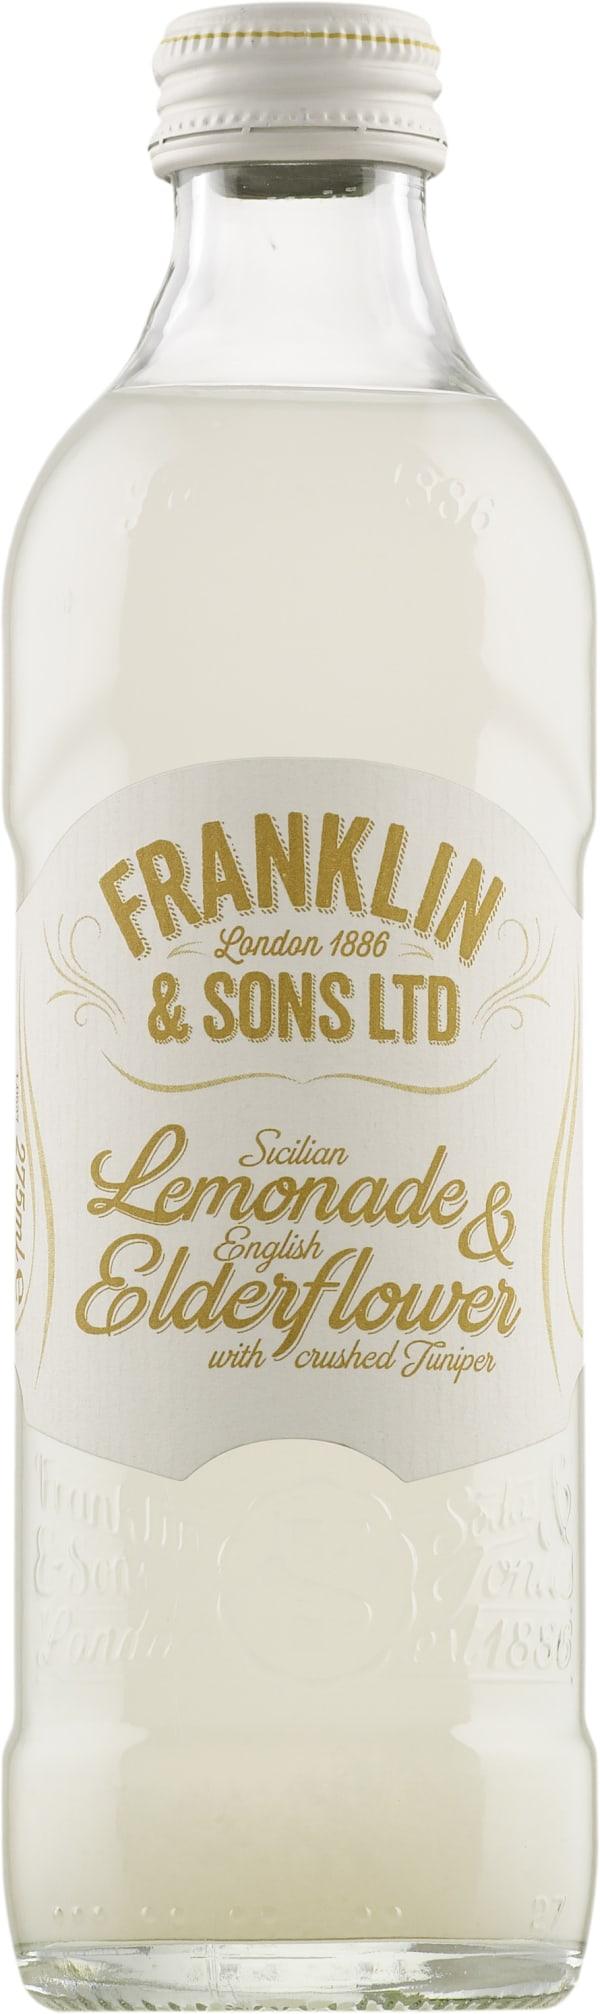 Franklin & Sons Sicilian Lemonade & English Elderflower